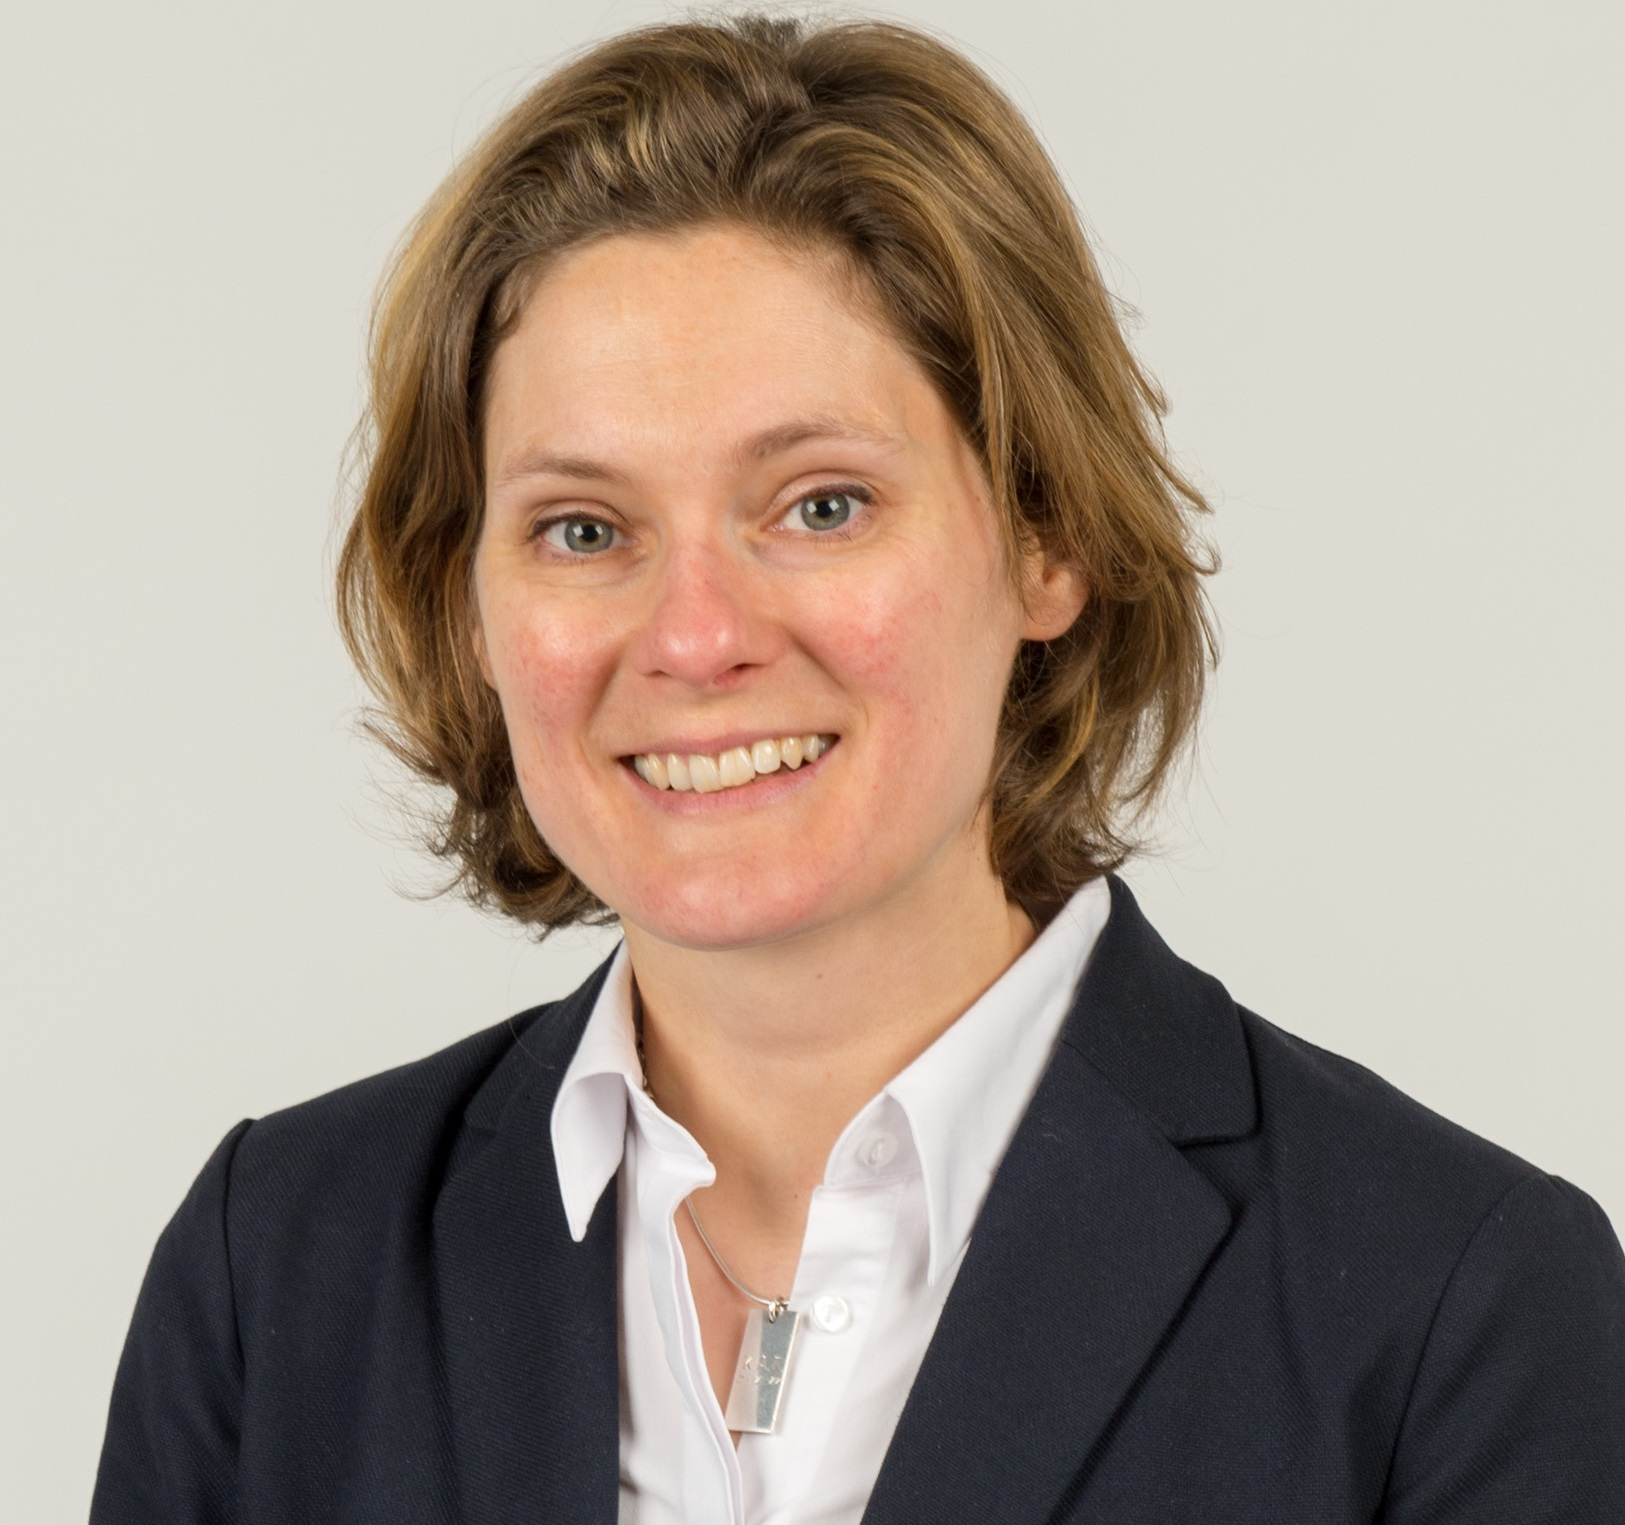 Dr Katie Robb